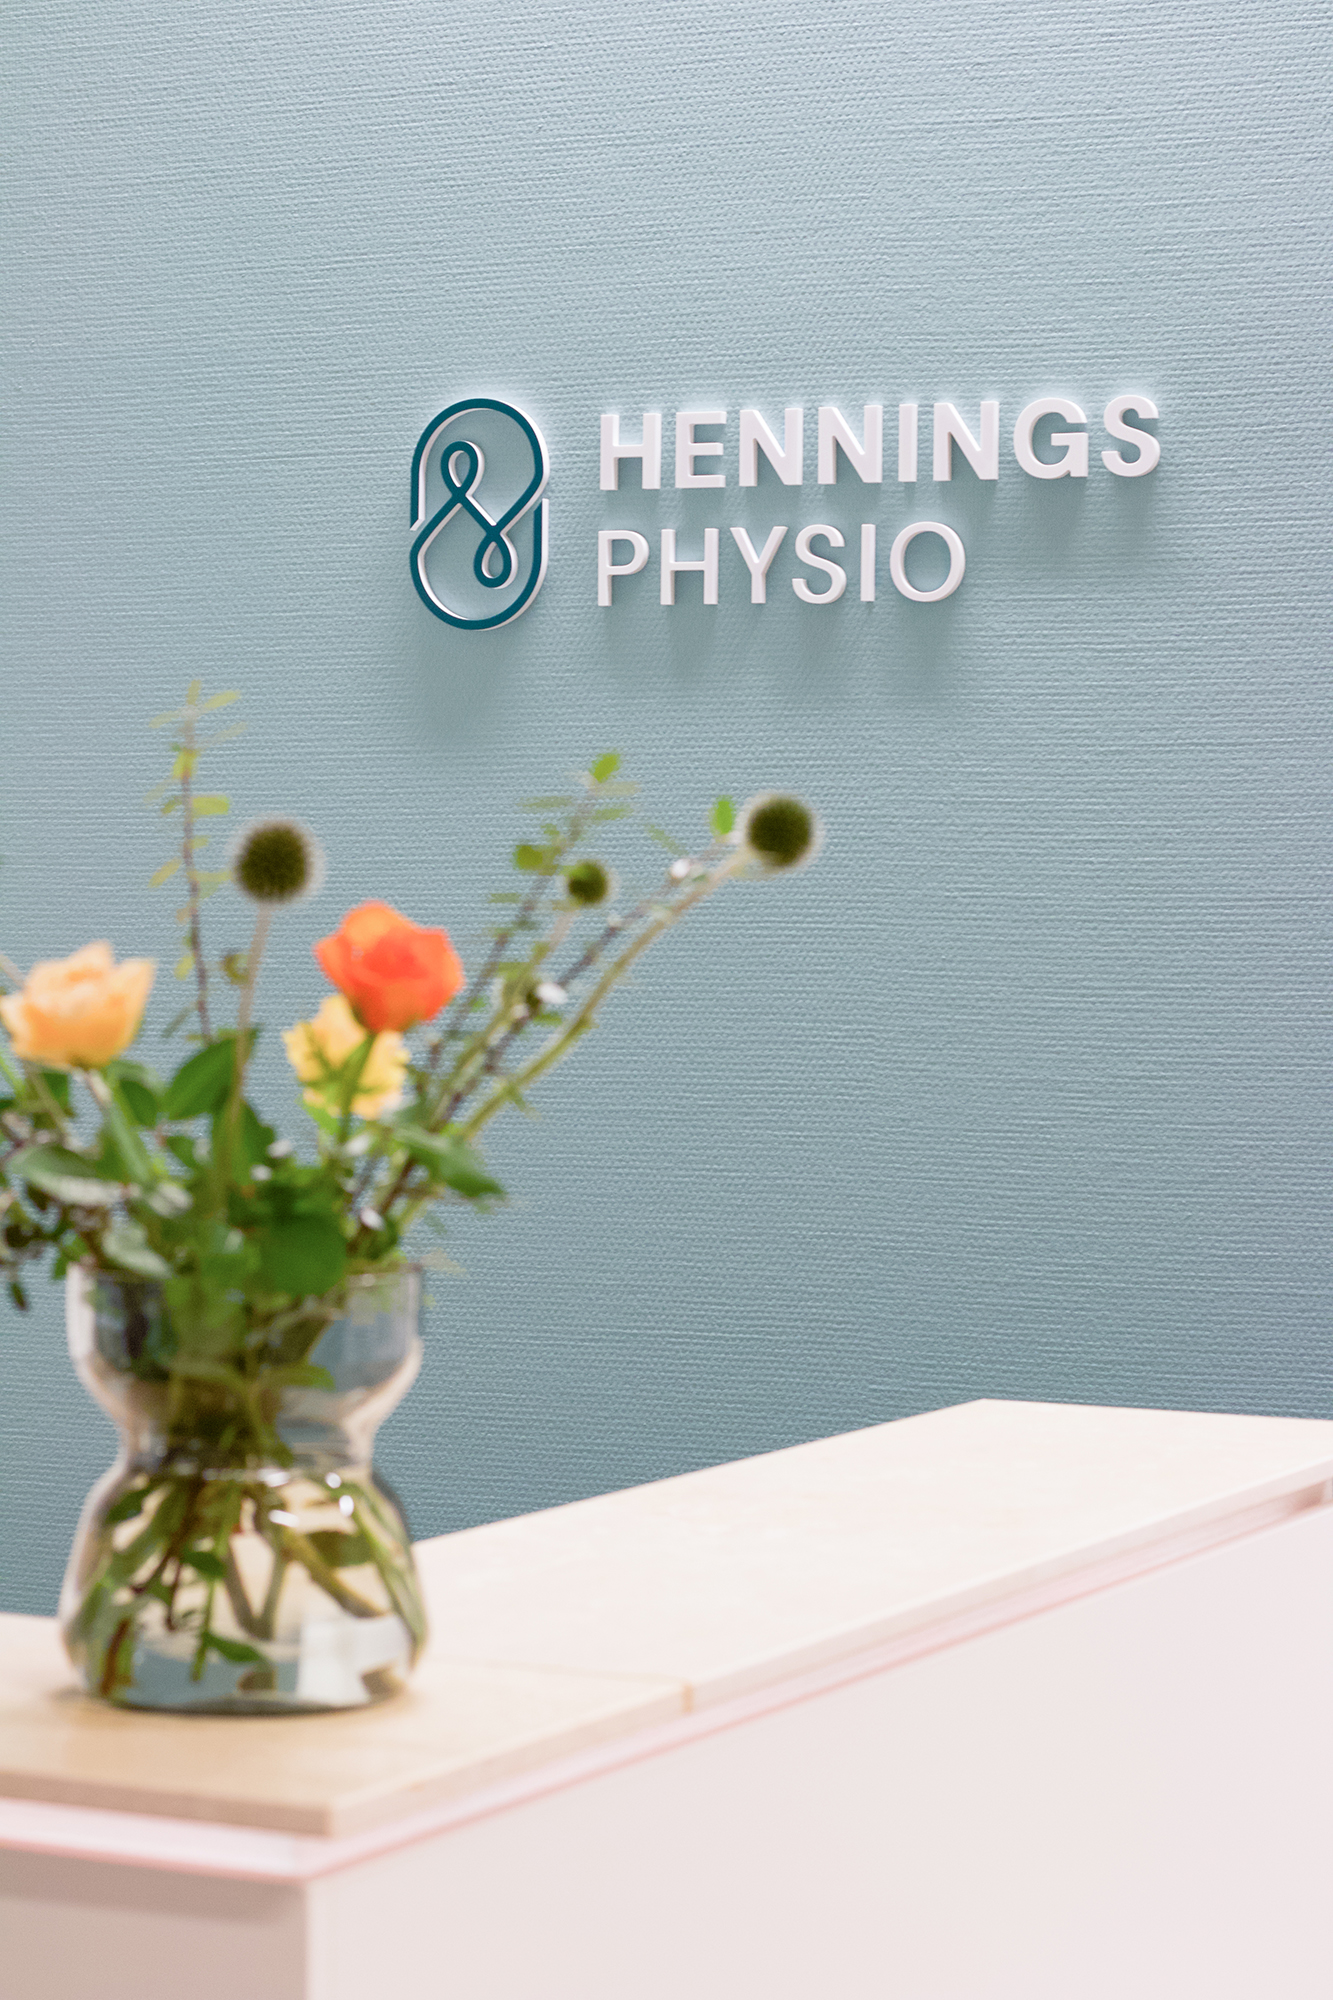 Hennings-Physio-Firmenlogo-Studio-Fondo